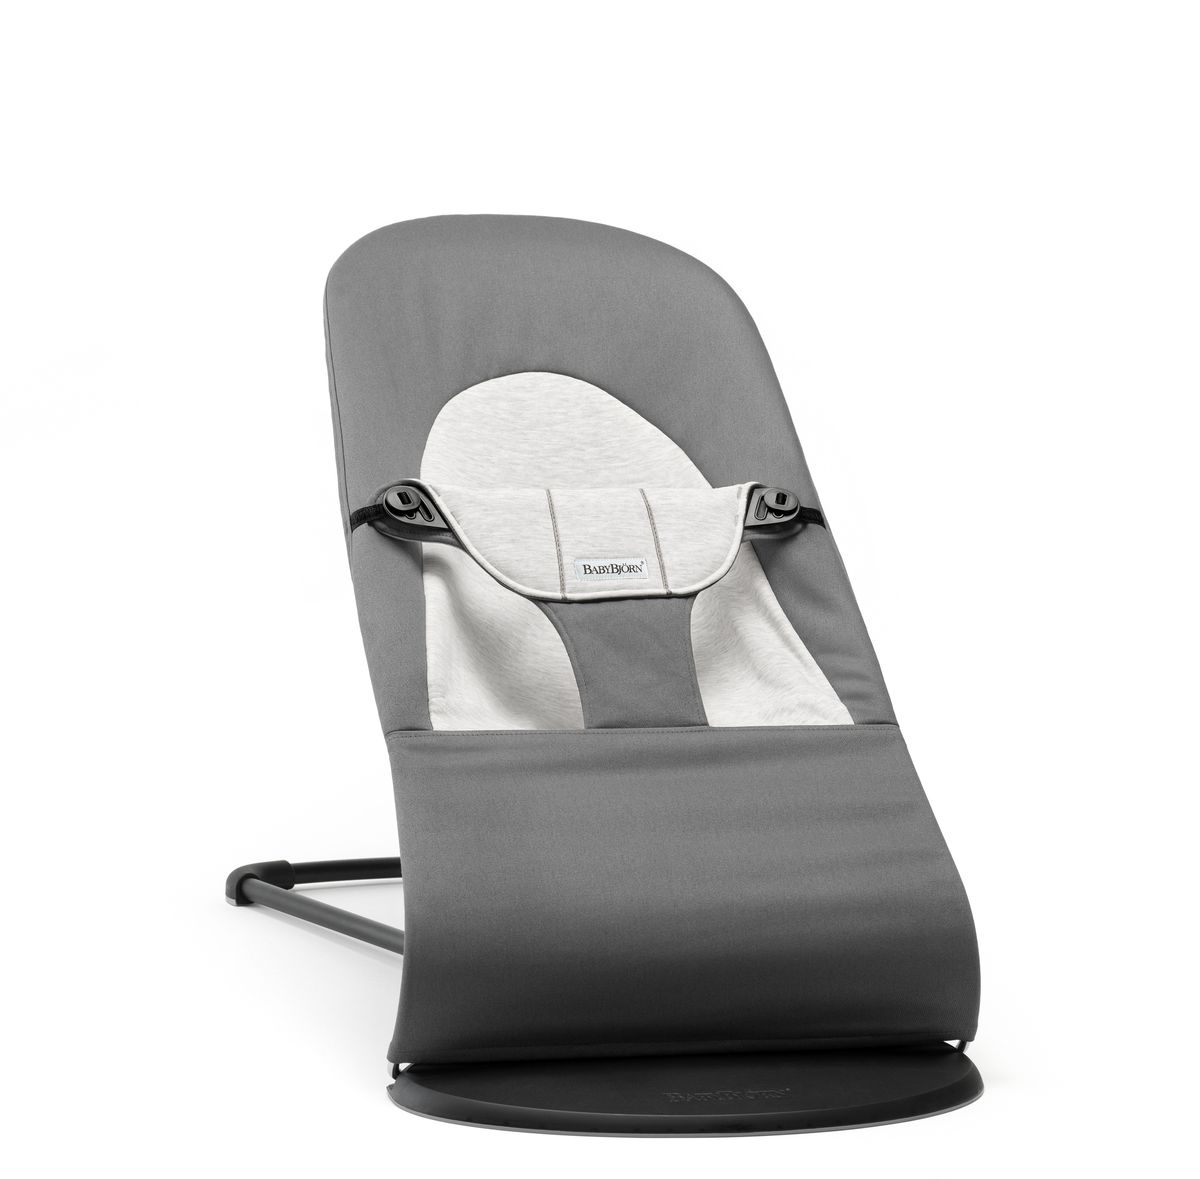 цена на BabyBjorn Кресло-шезлонг Balance Jersey, цвет: темно-серый, серый